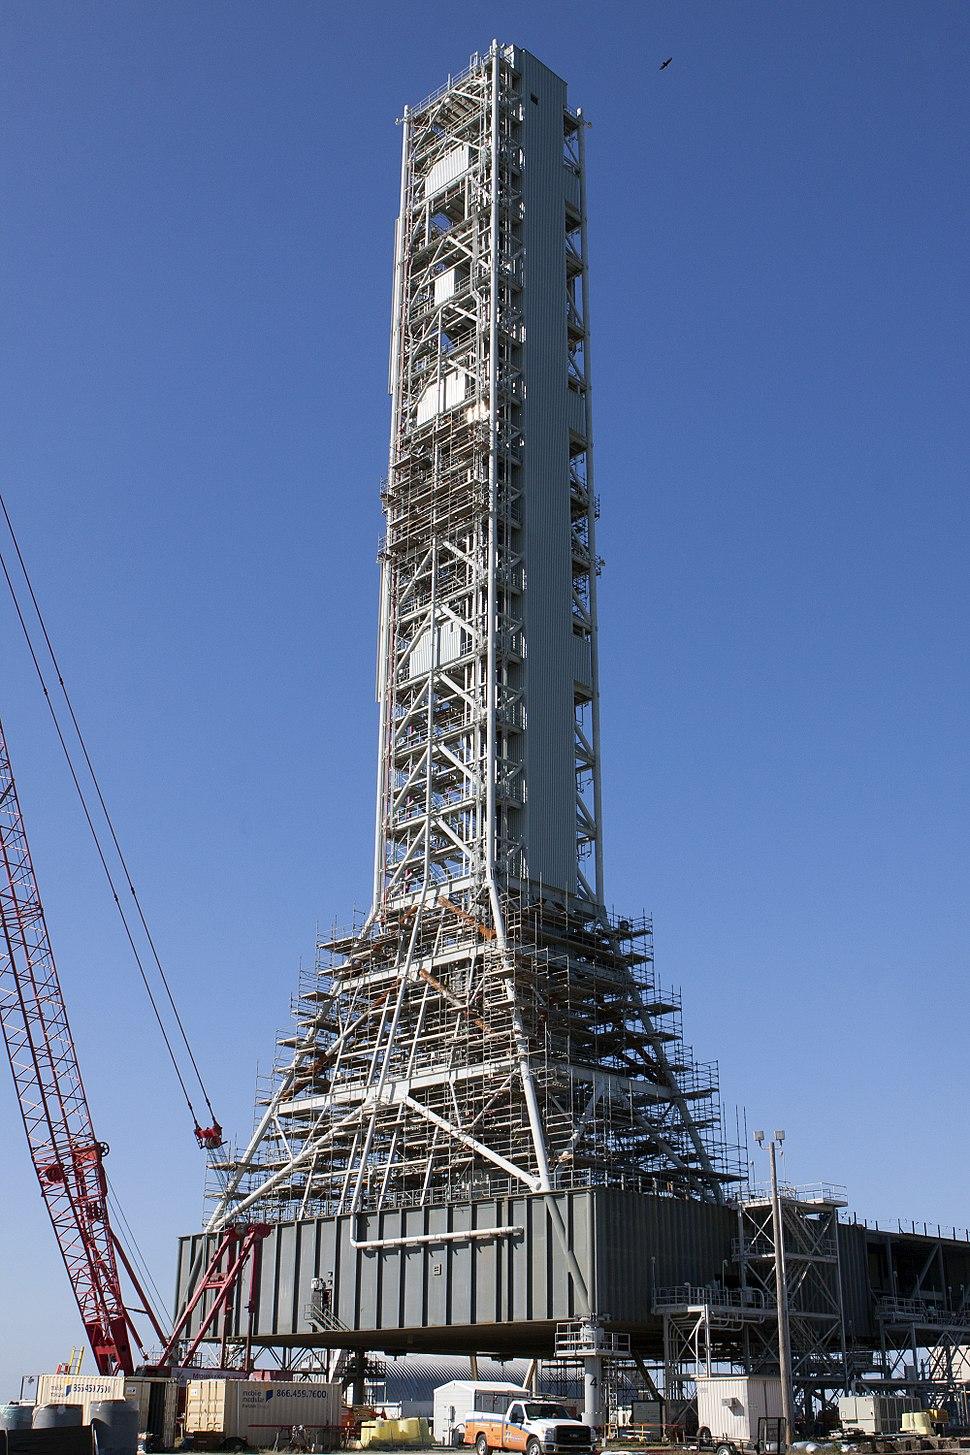 Mobile Launcher under modification for SLS (KSC-2014-4886)